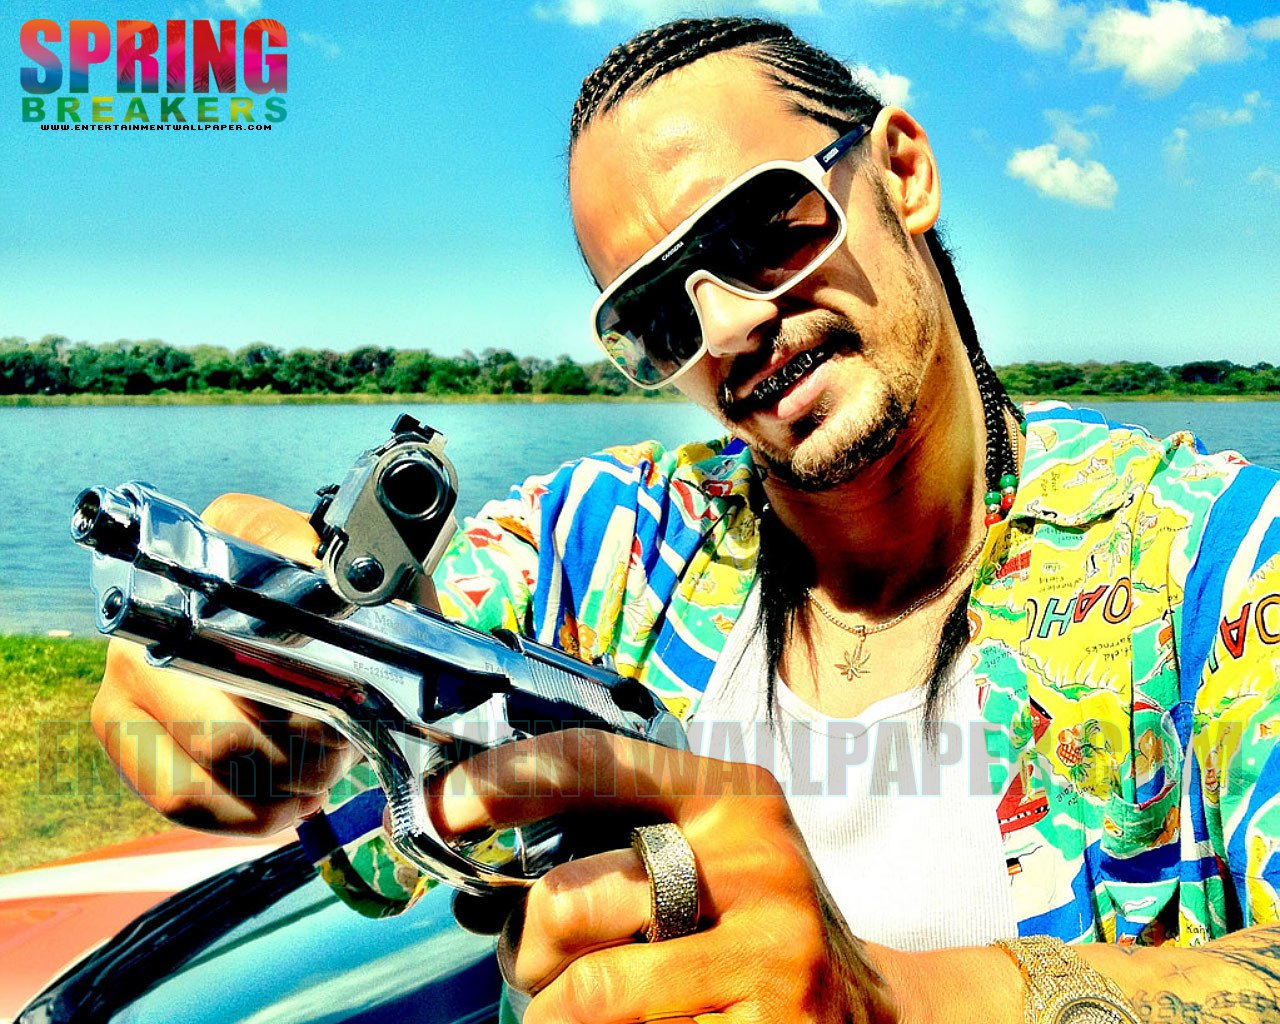 Spring Breakers [2013]   Upcoming Movies Wallpaper 33873896 1280x1024